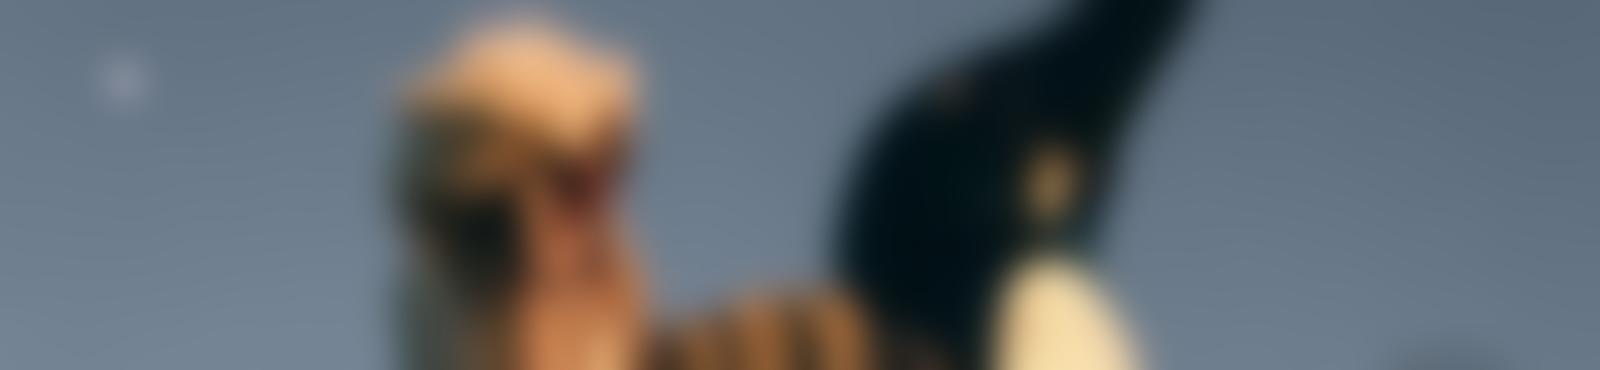 Blurred b5323c4c 7741 428c b0eb 8e486a0ab1a8